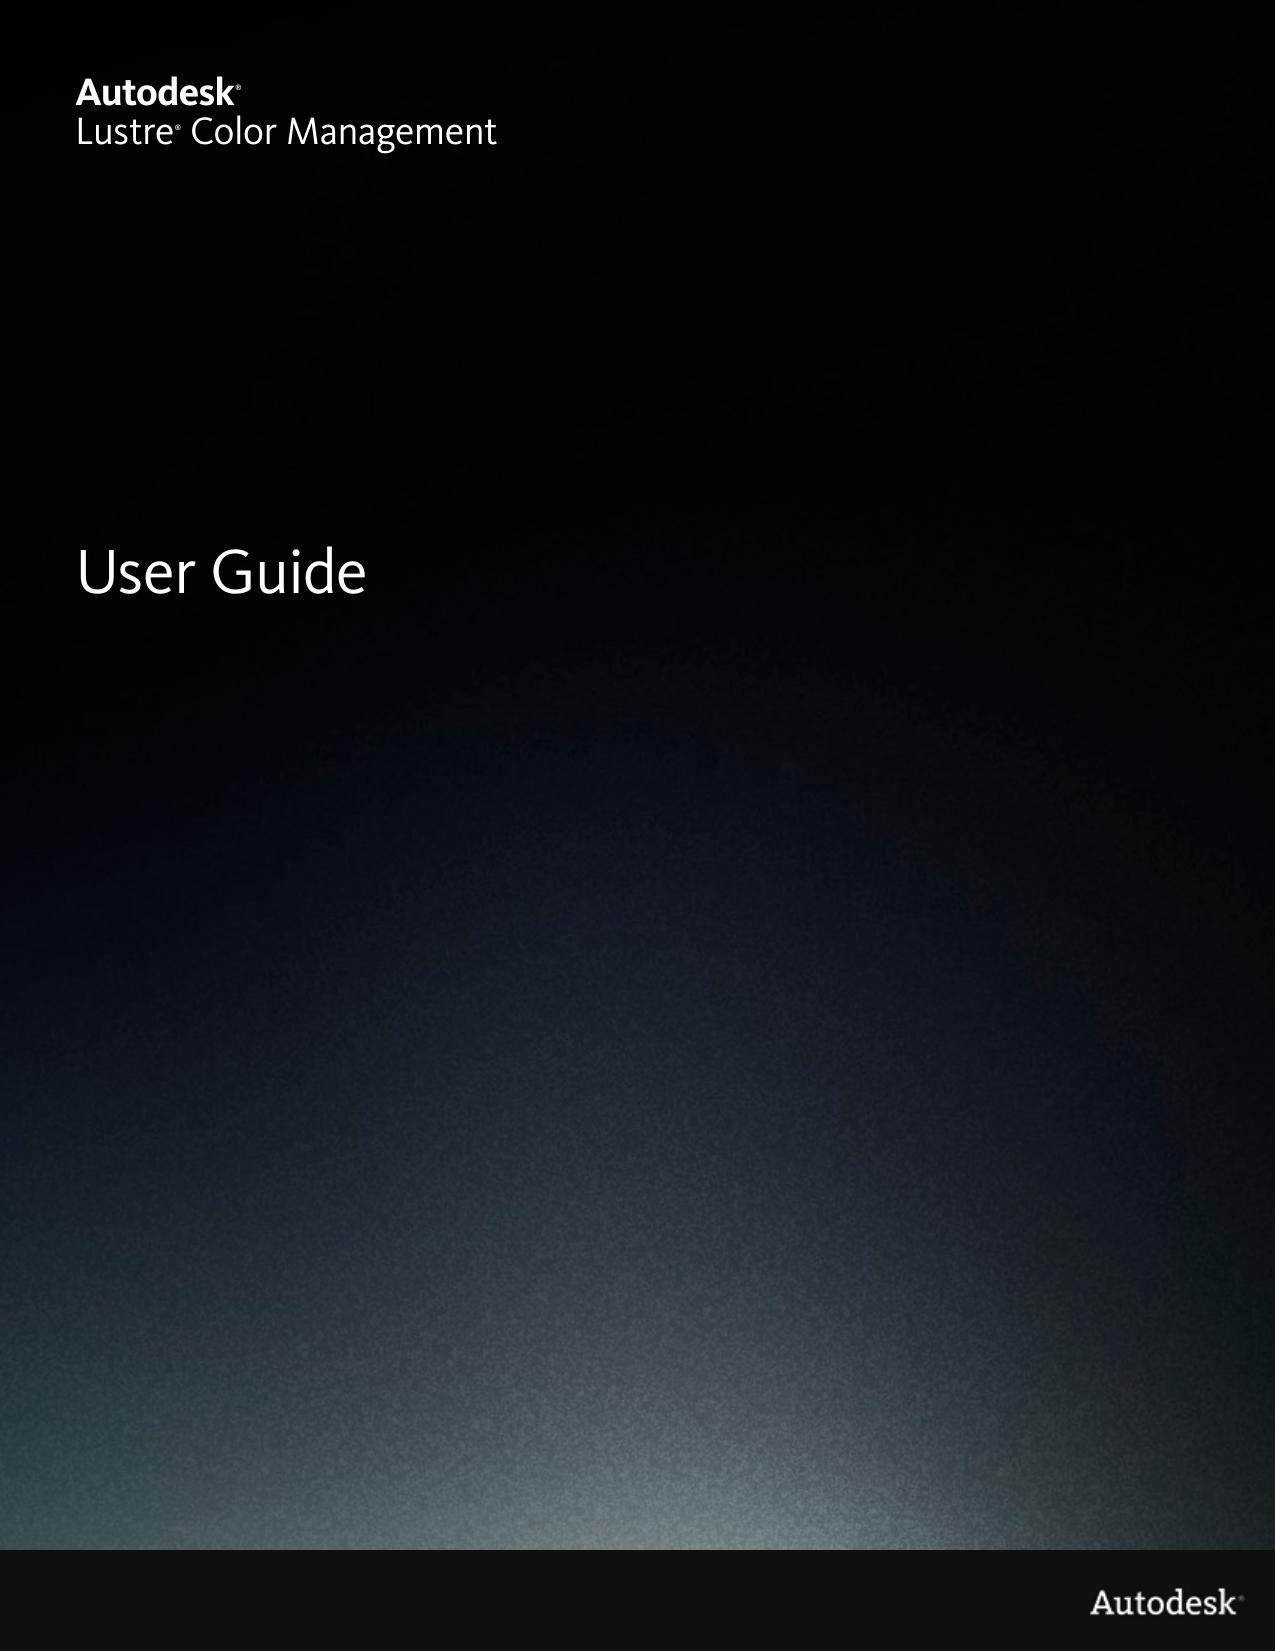 Autodesk Lustre Color Management User Guide   manualzz com